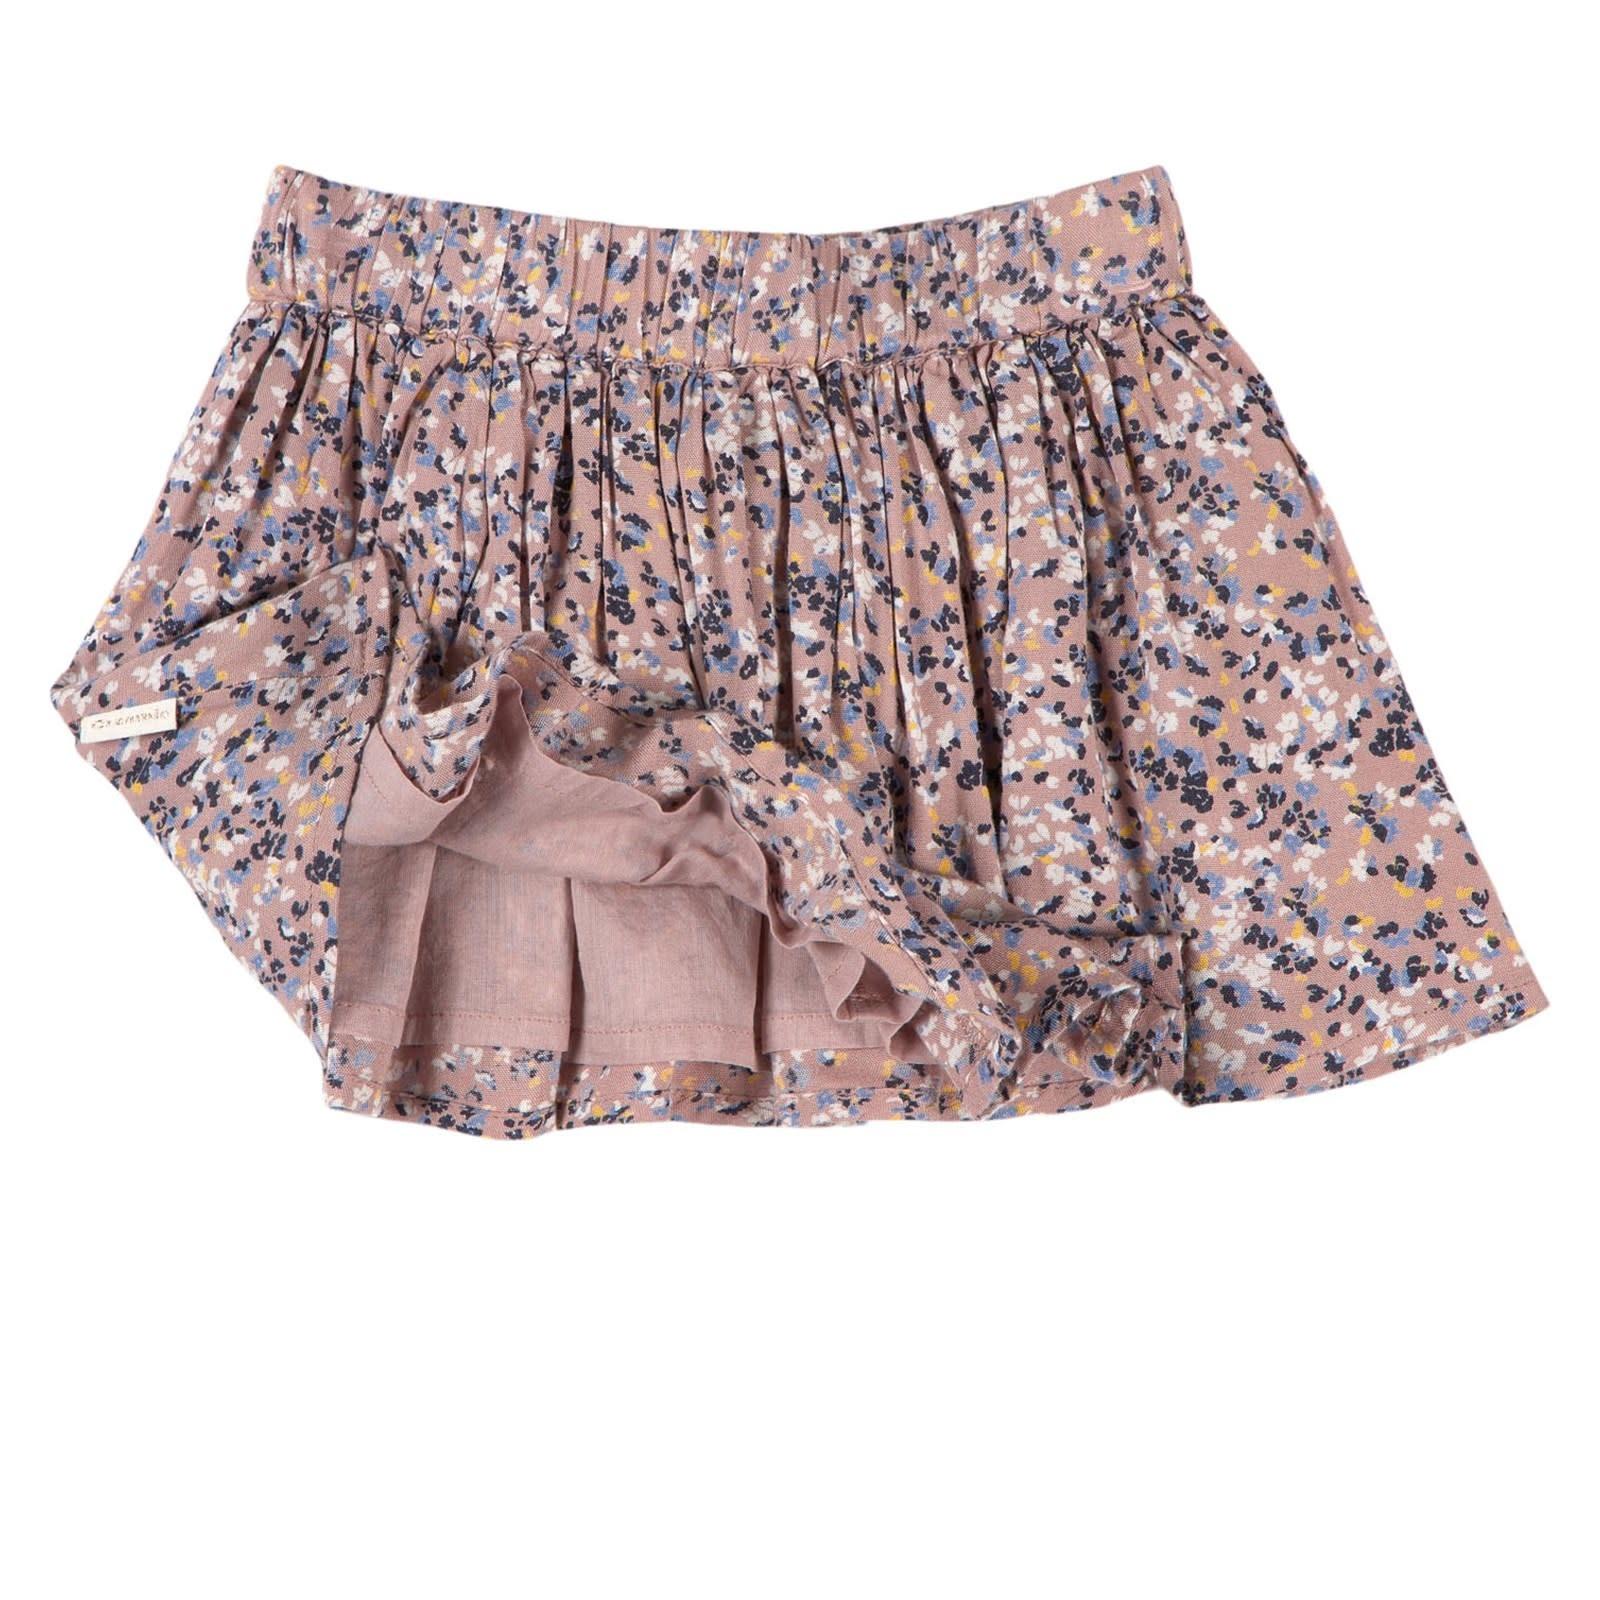 Cotton Skirt - Adobe Rose Floral